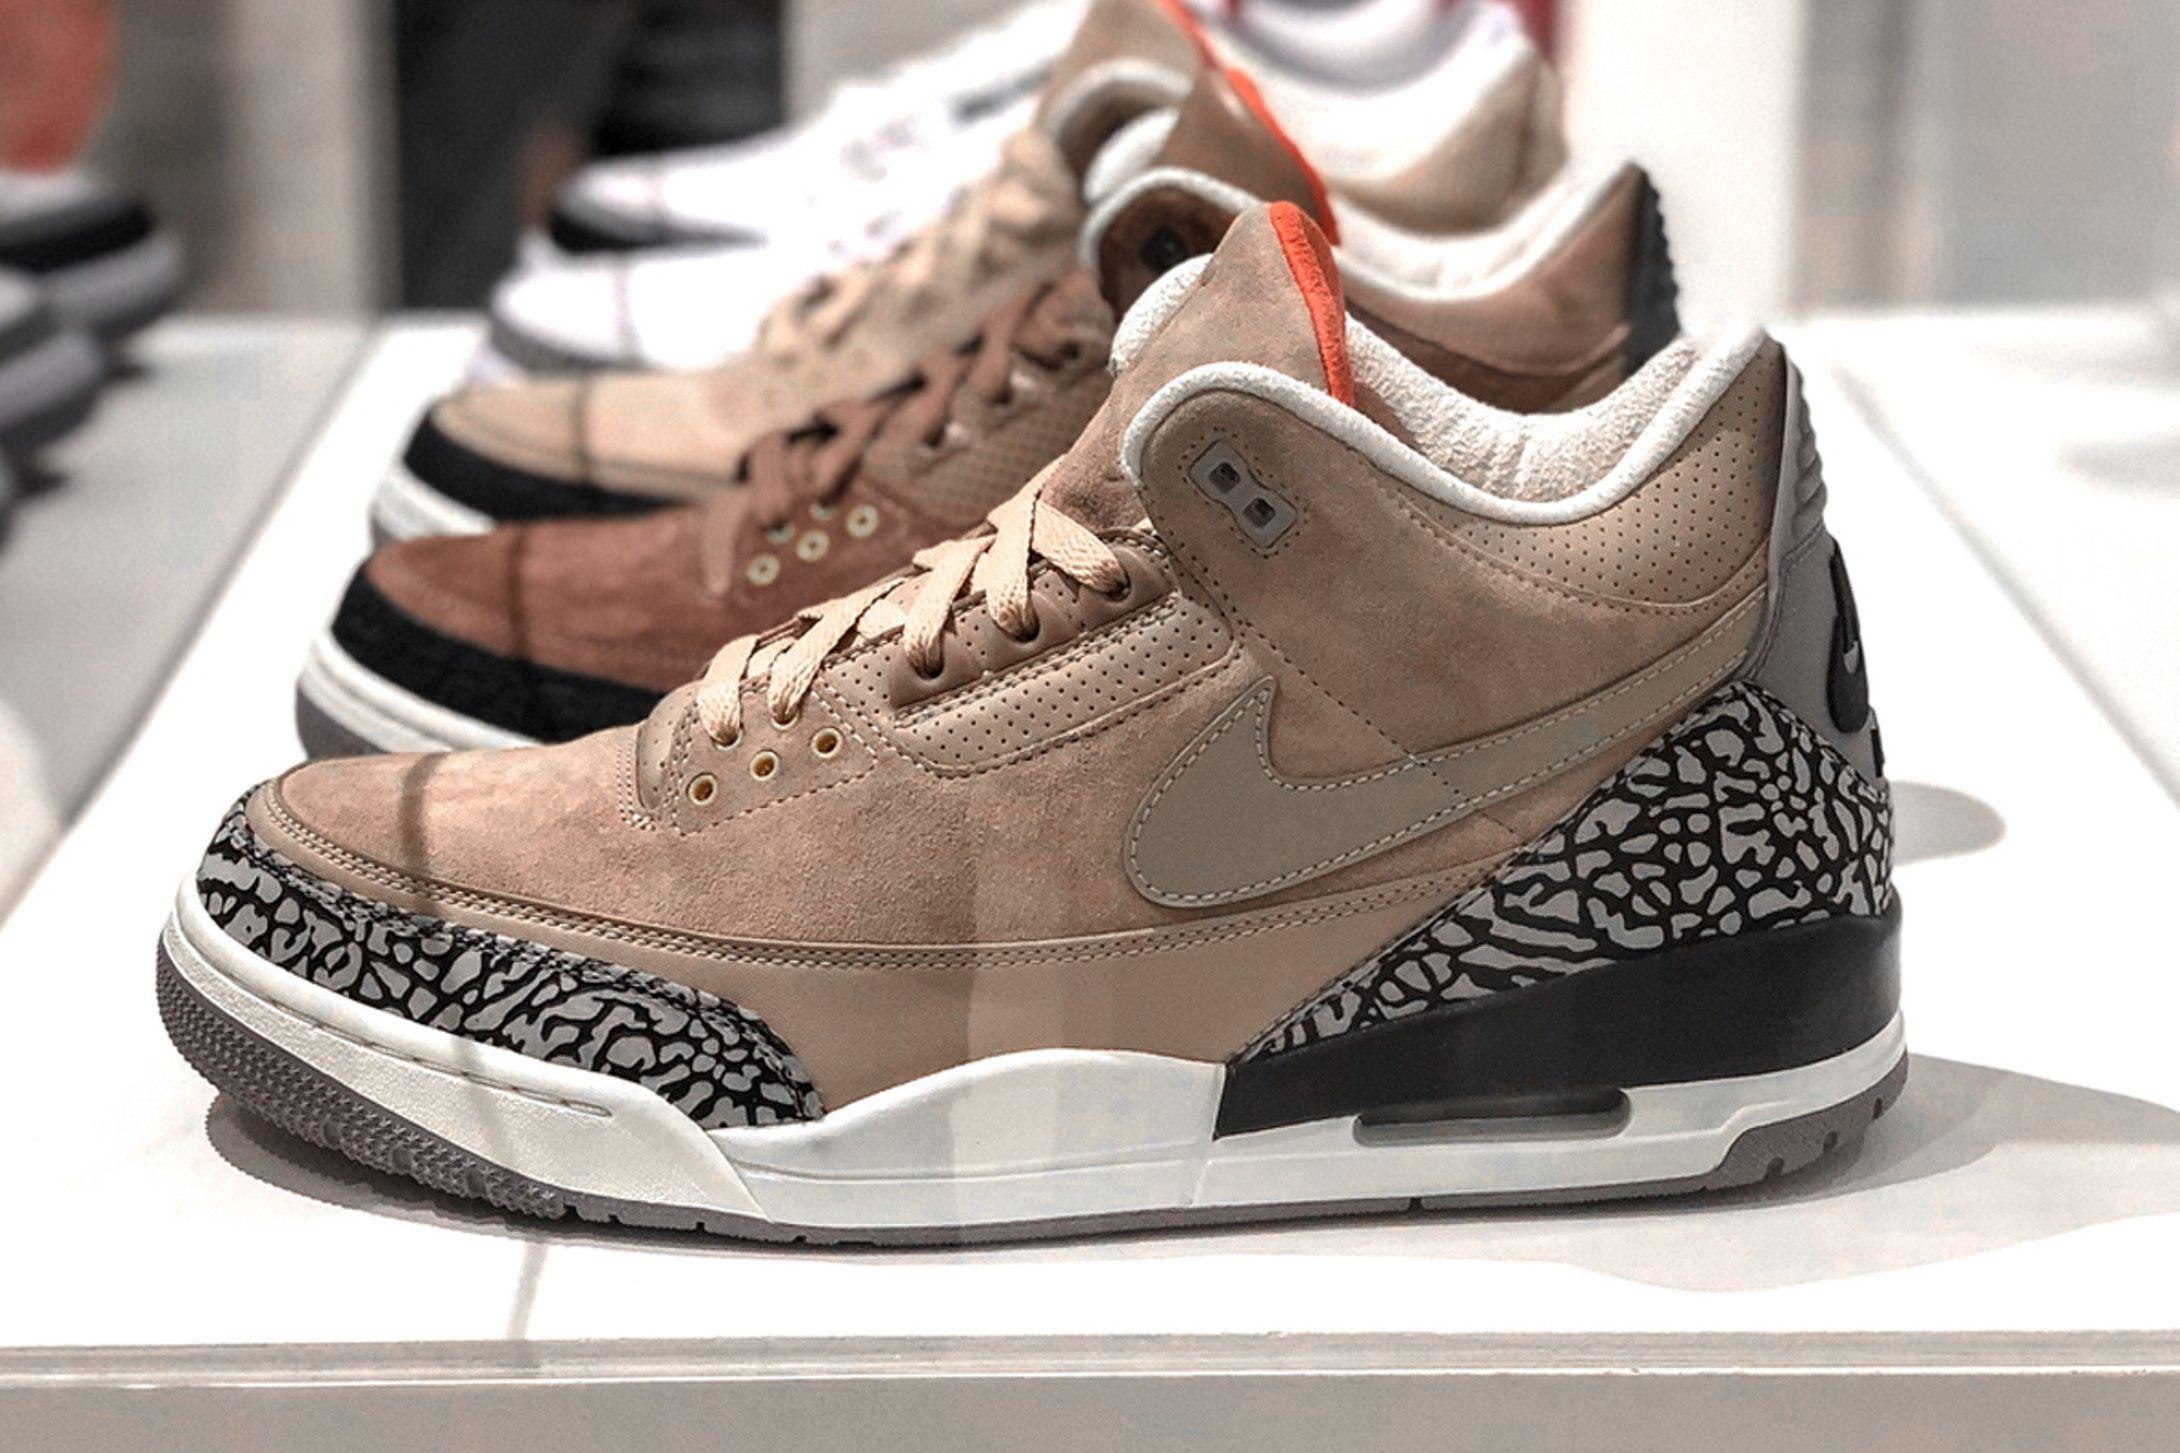 new styles d314a 9abb1 Air Jordan 3